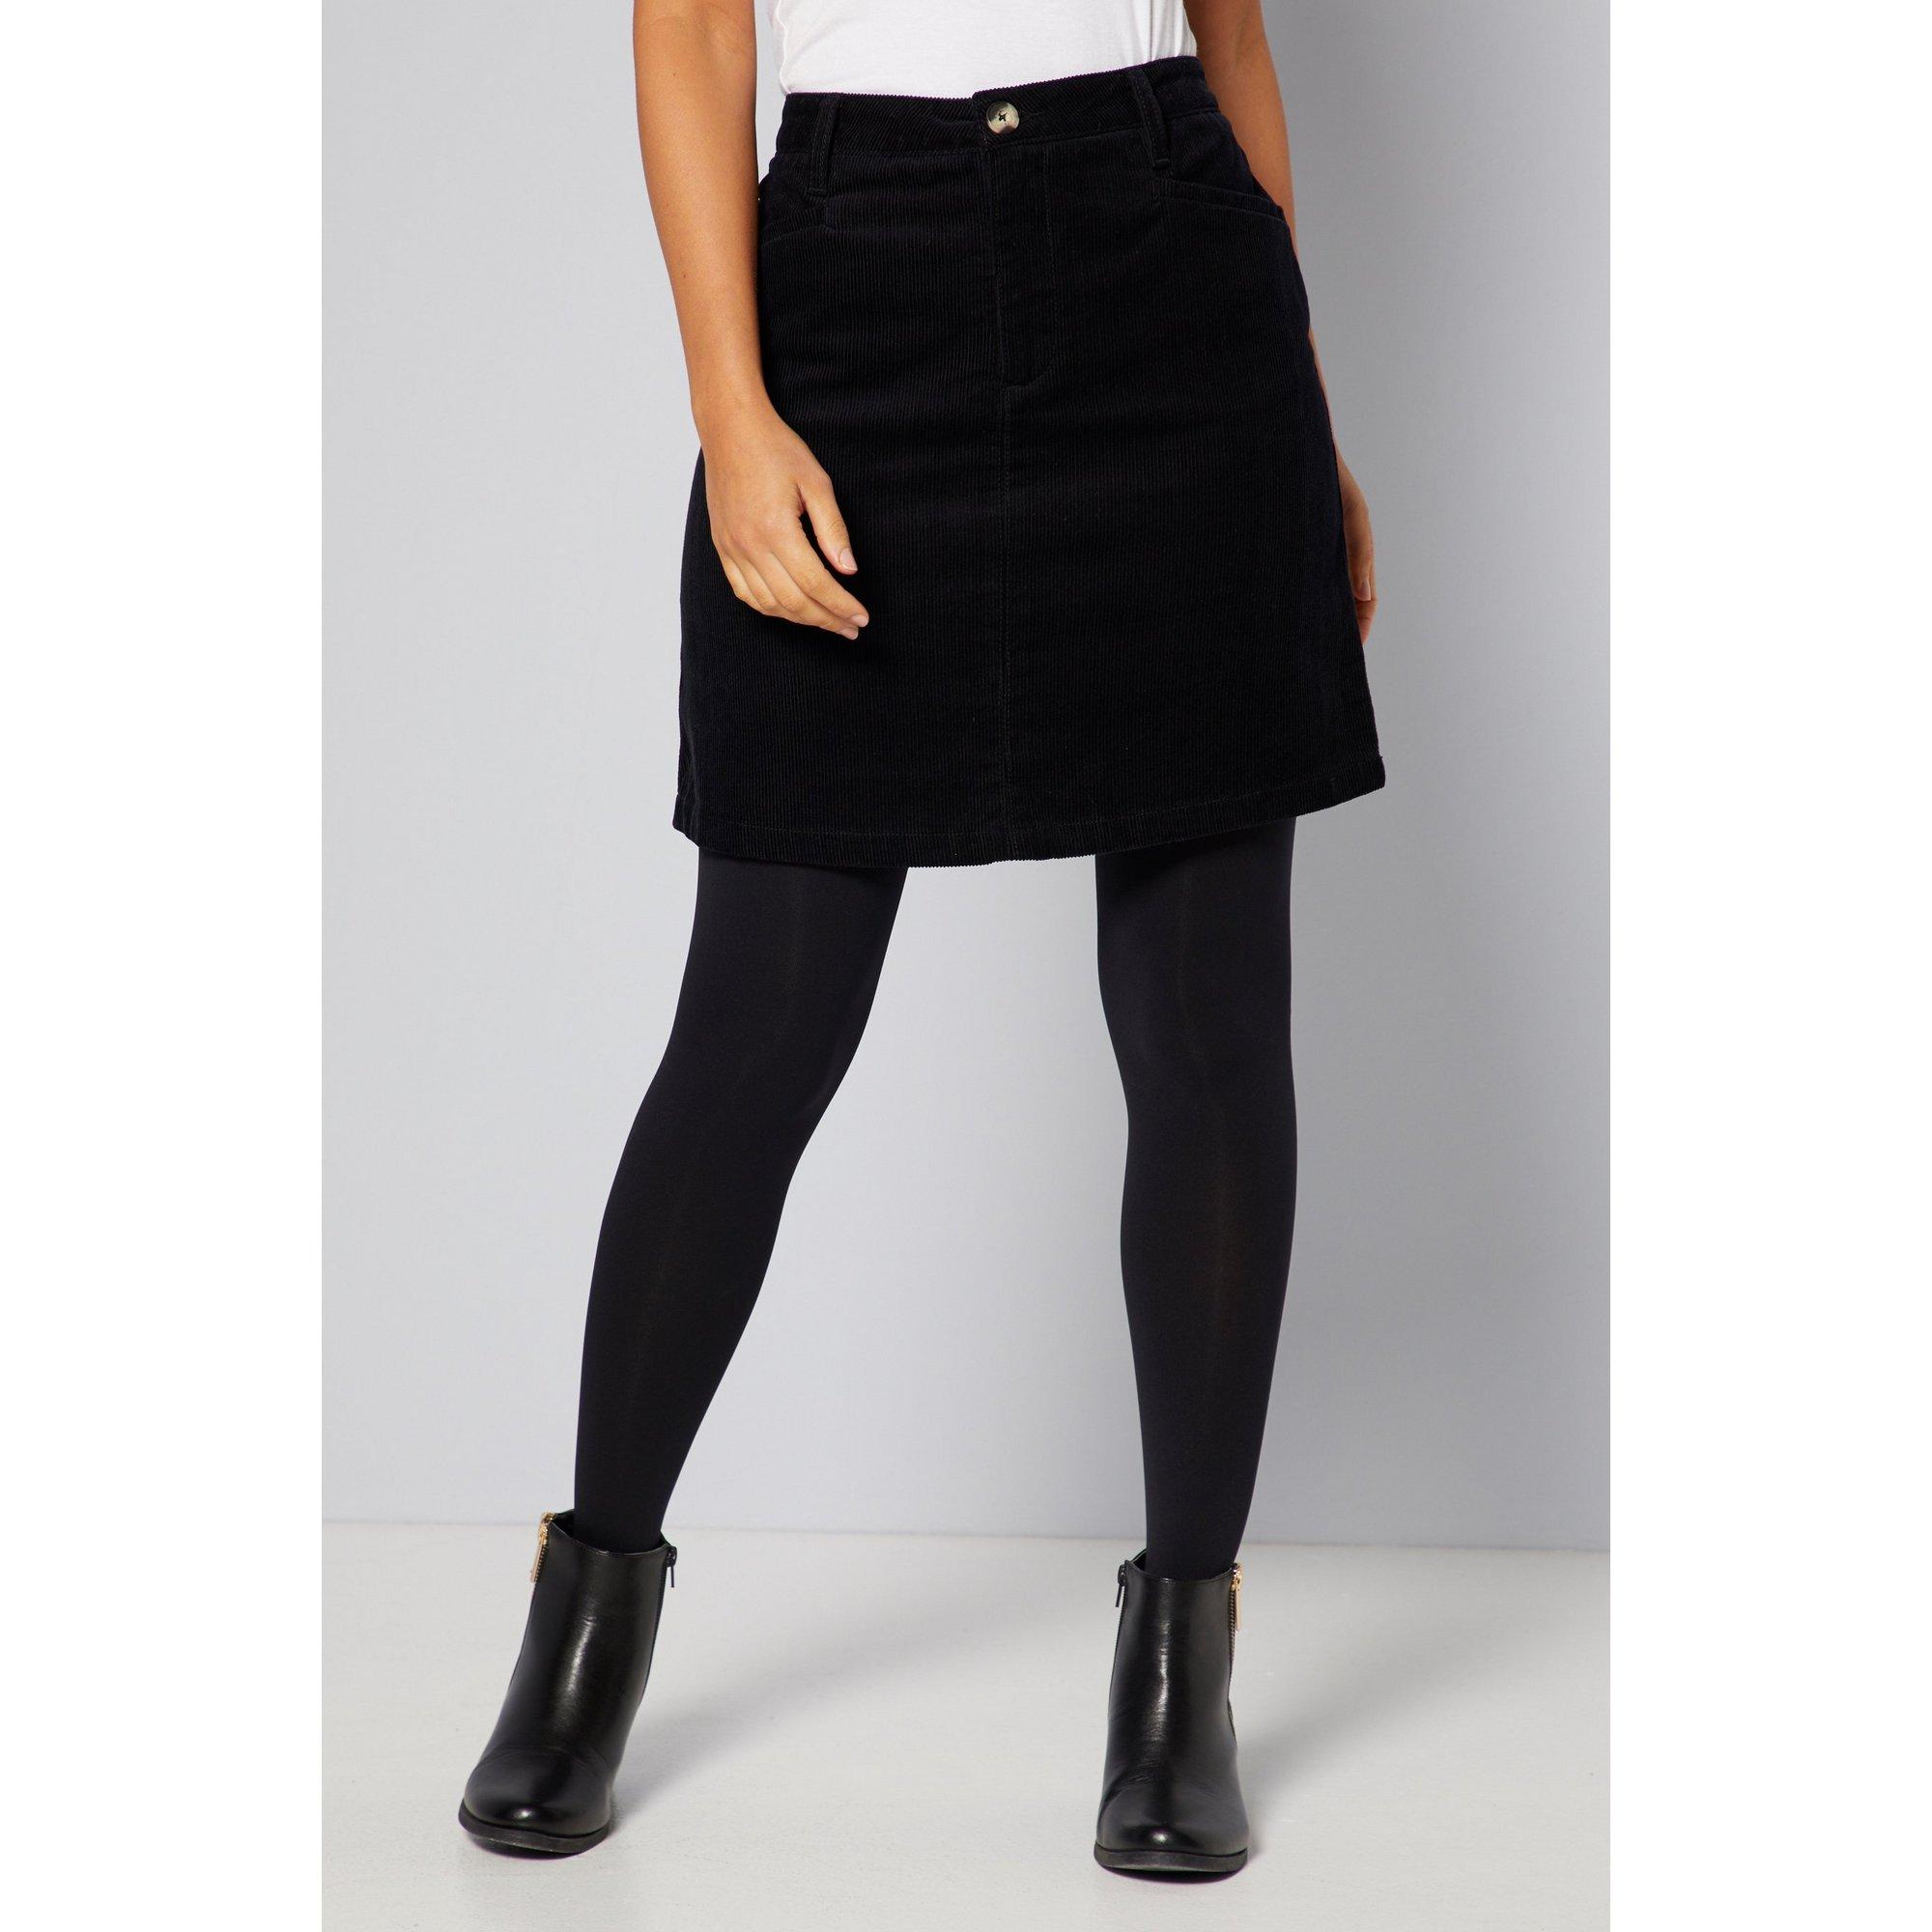 Image of Cord Black Mini Skirt